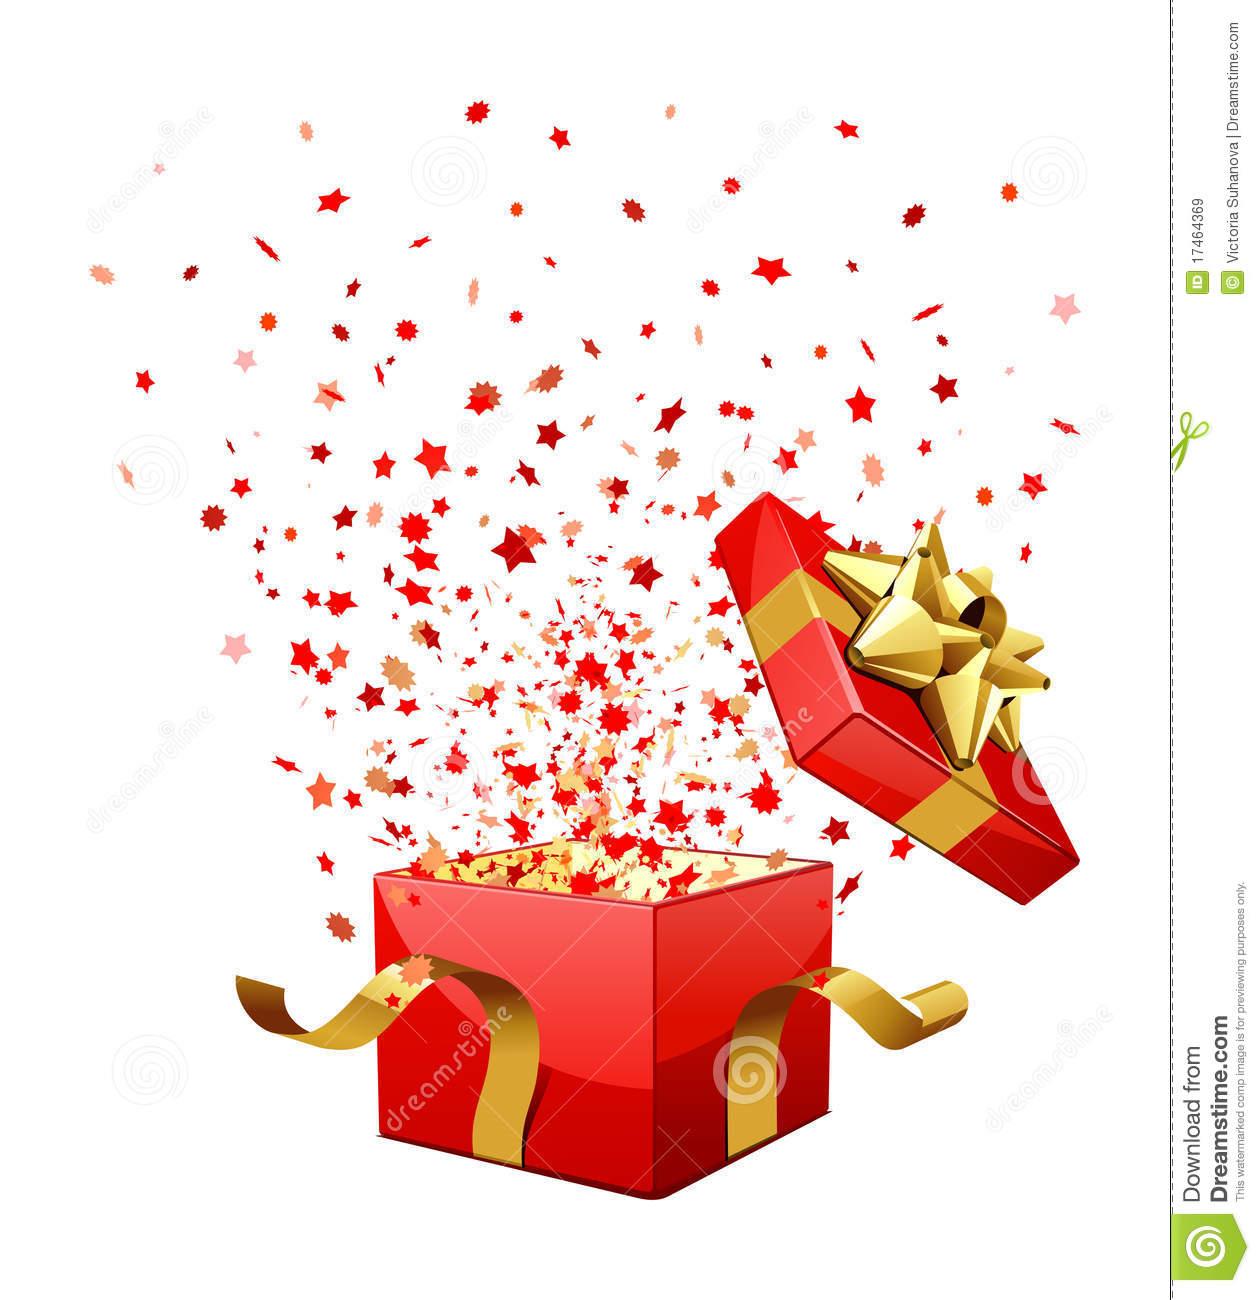 Caja regalo navidad vector png